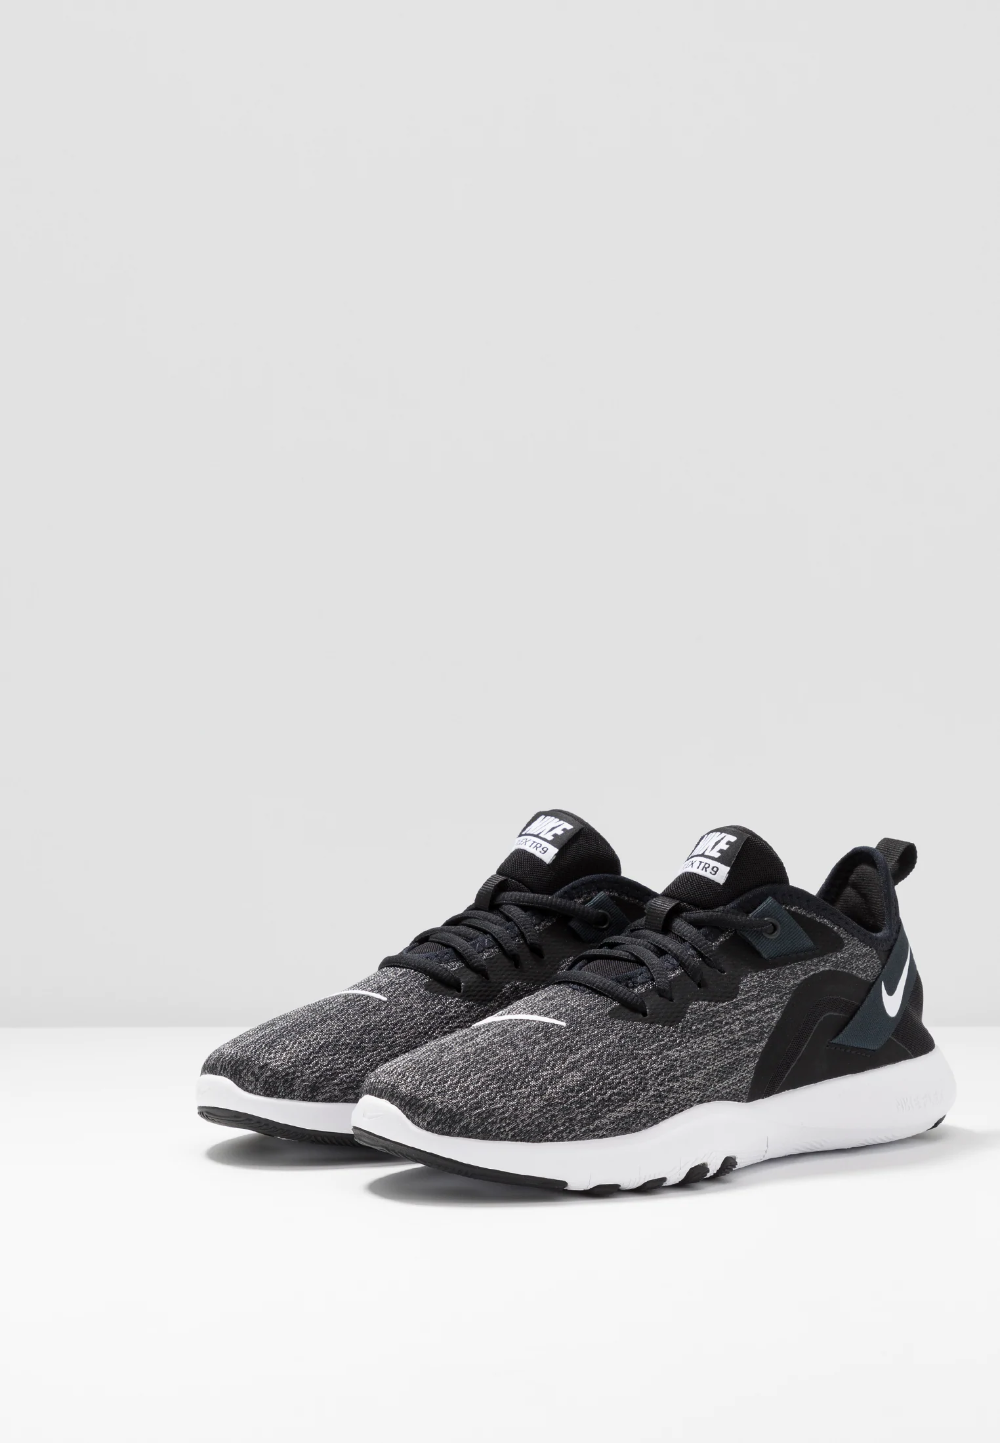 misil tarde Exclusivo  Nike Performance FLEX TRAINER 9 - Sports shoes -  black/white/anthracite/black - Zalando.de | Sports shoes, Black running  shoes, Nike flex